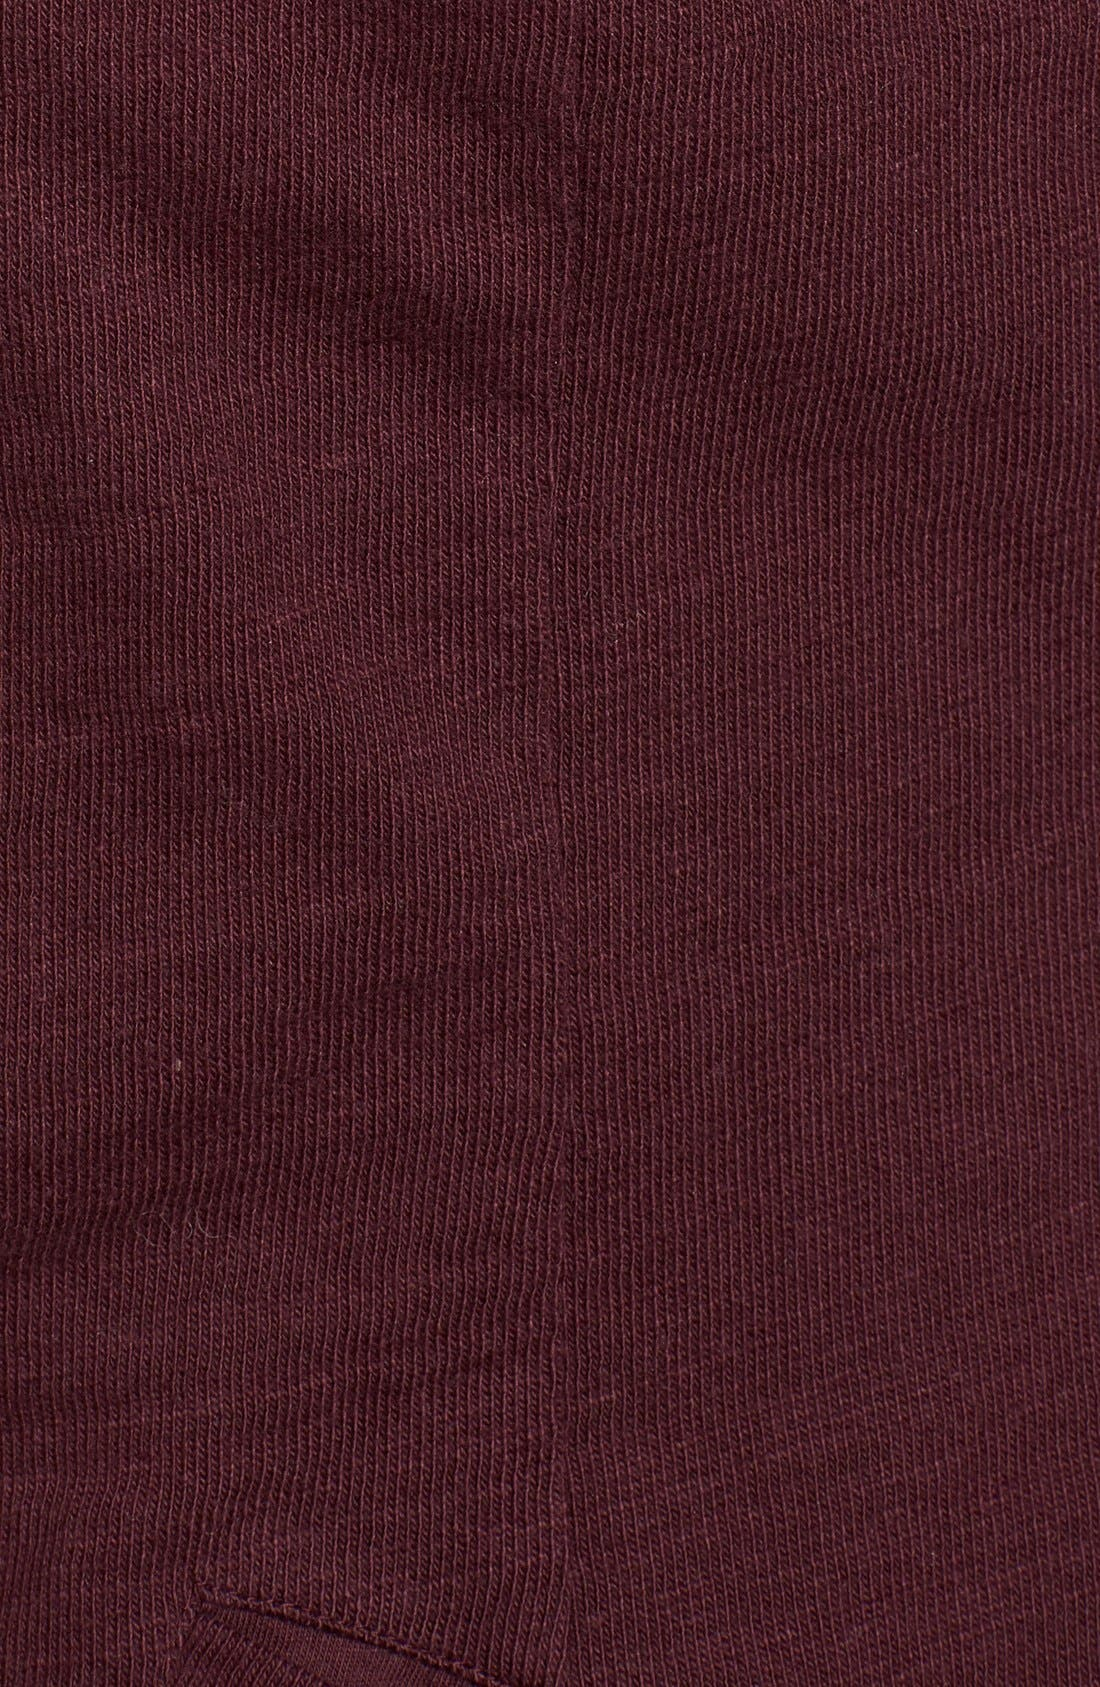 Knit One-Button Blazer,                             Alternate thumbnail 115, color,